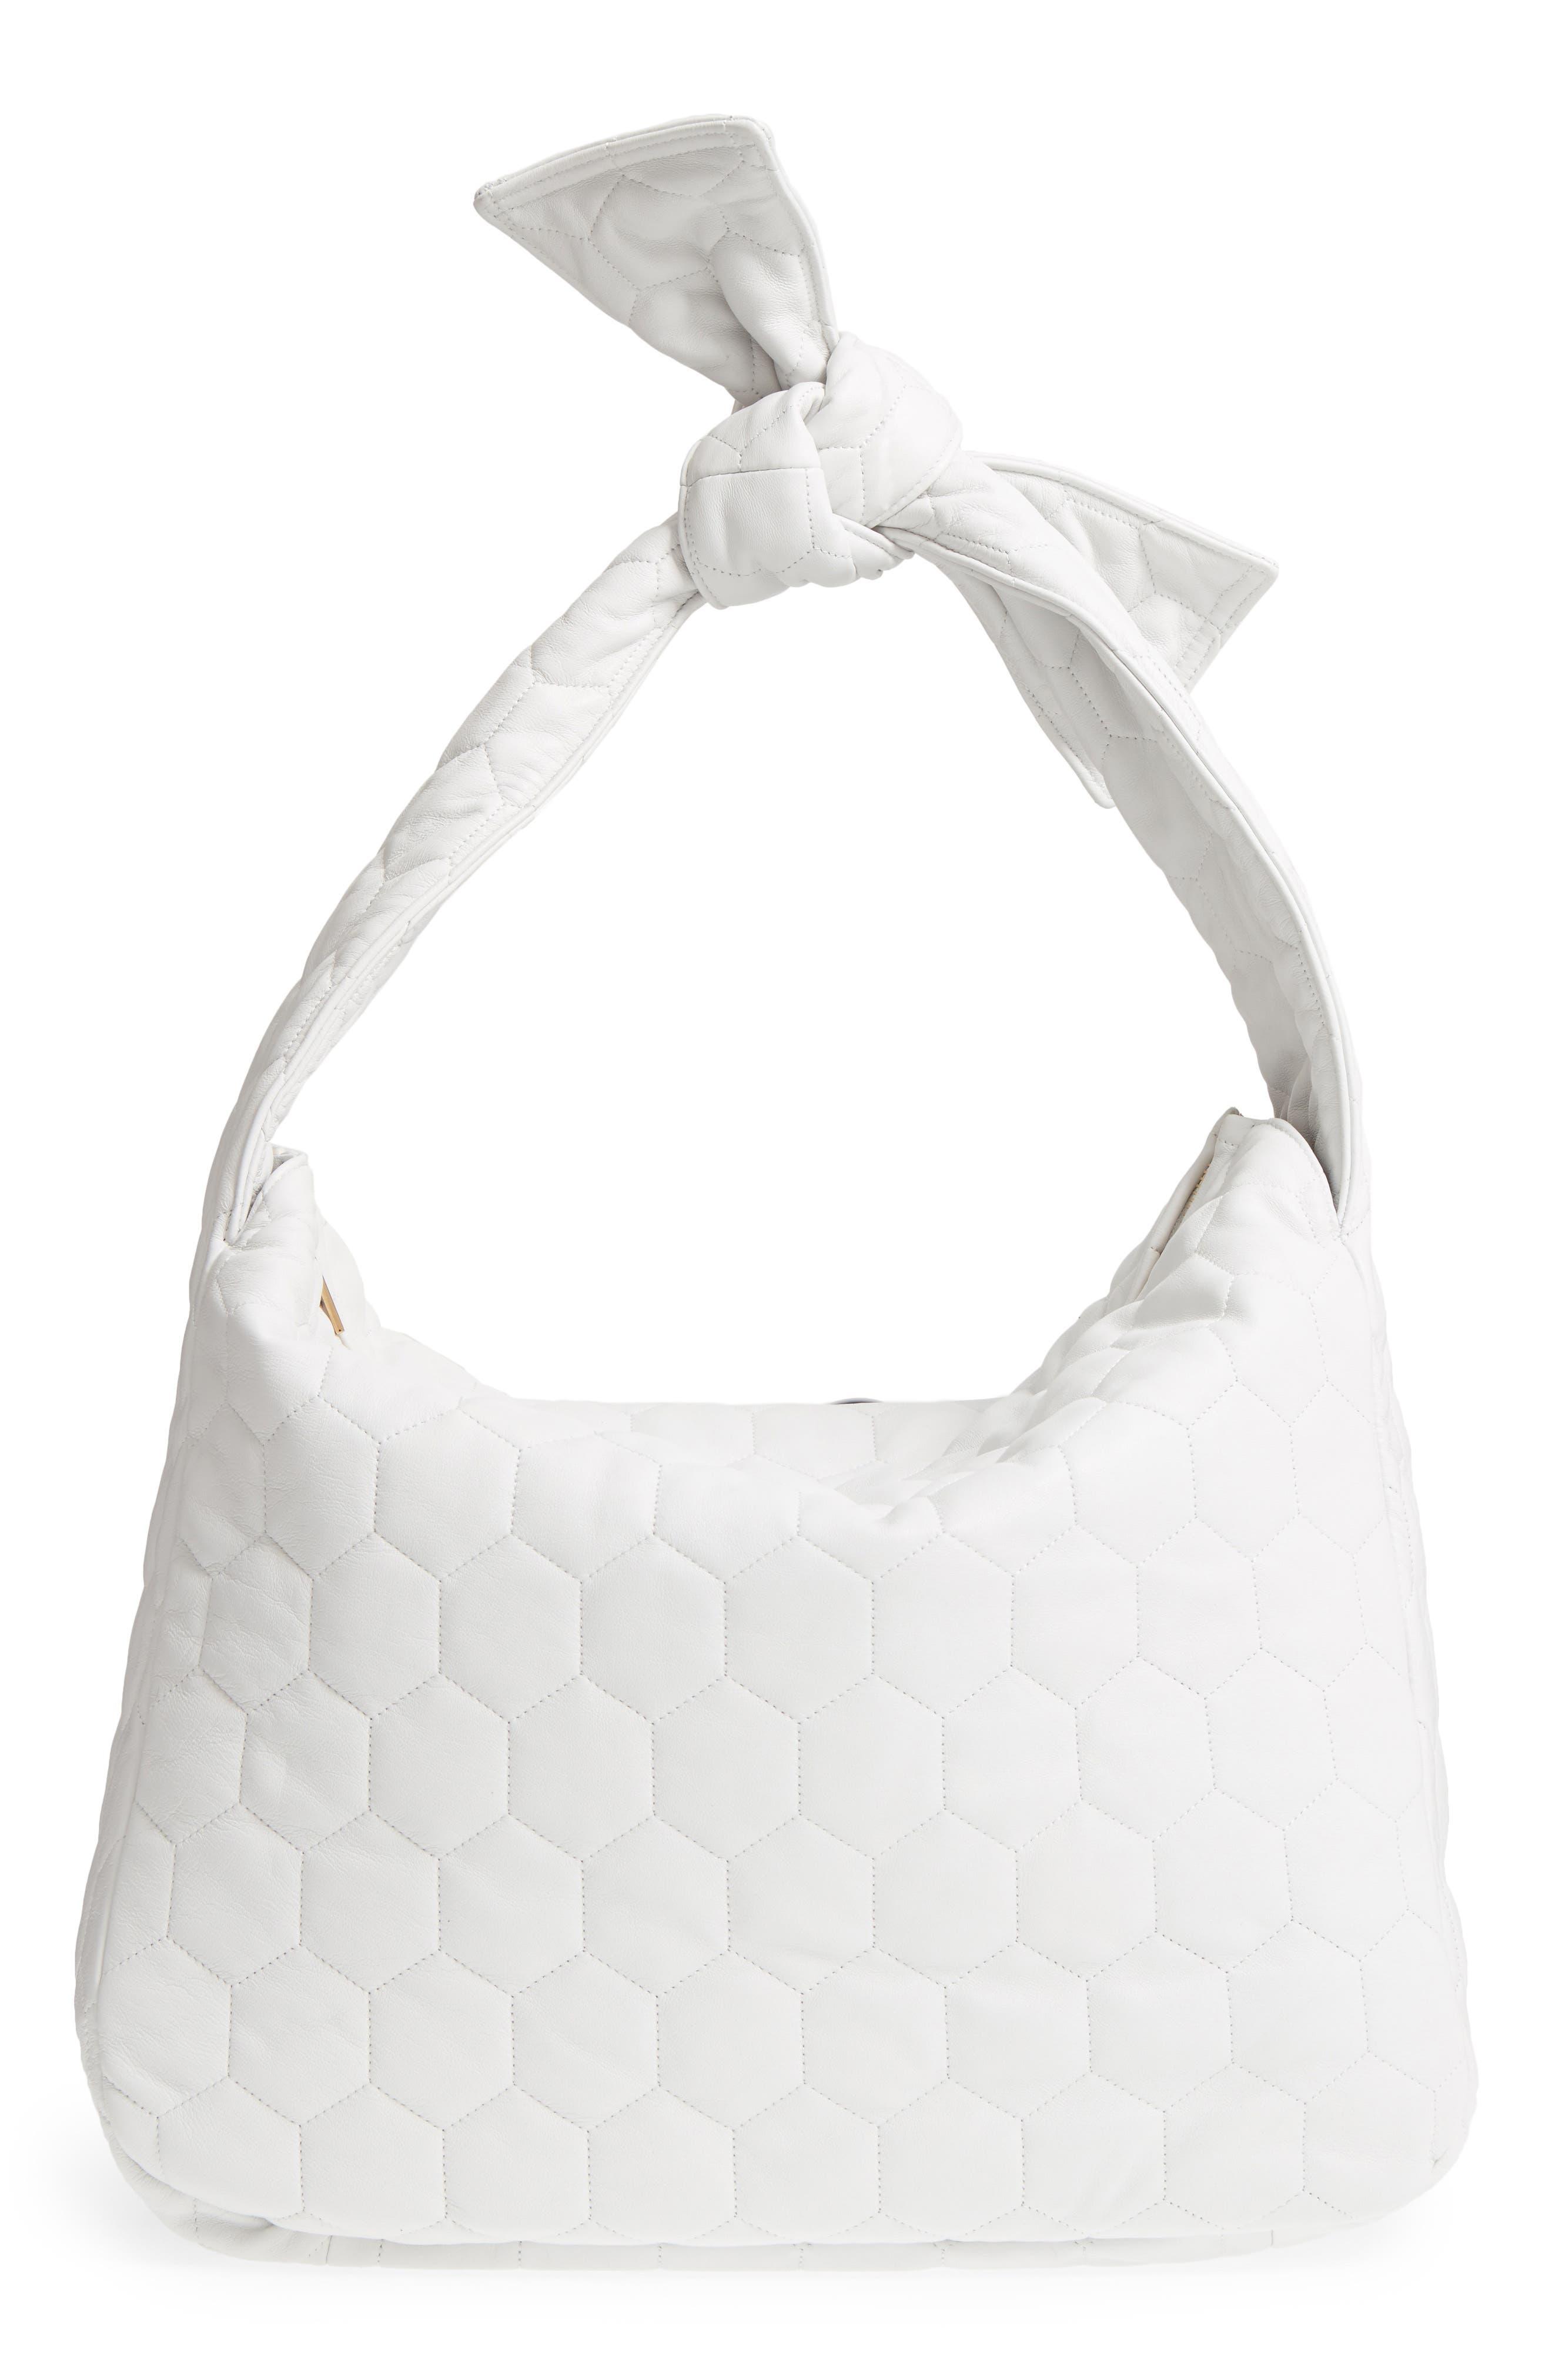 Balloon Leather Shoulder Bag,                             Main thumbnail 1, color,